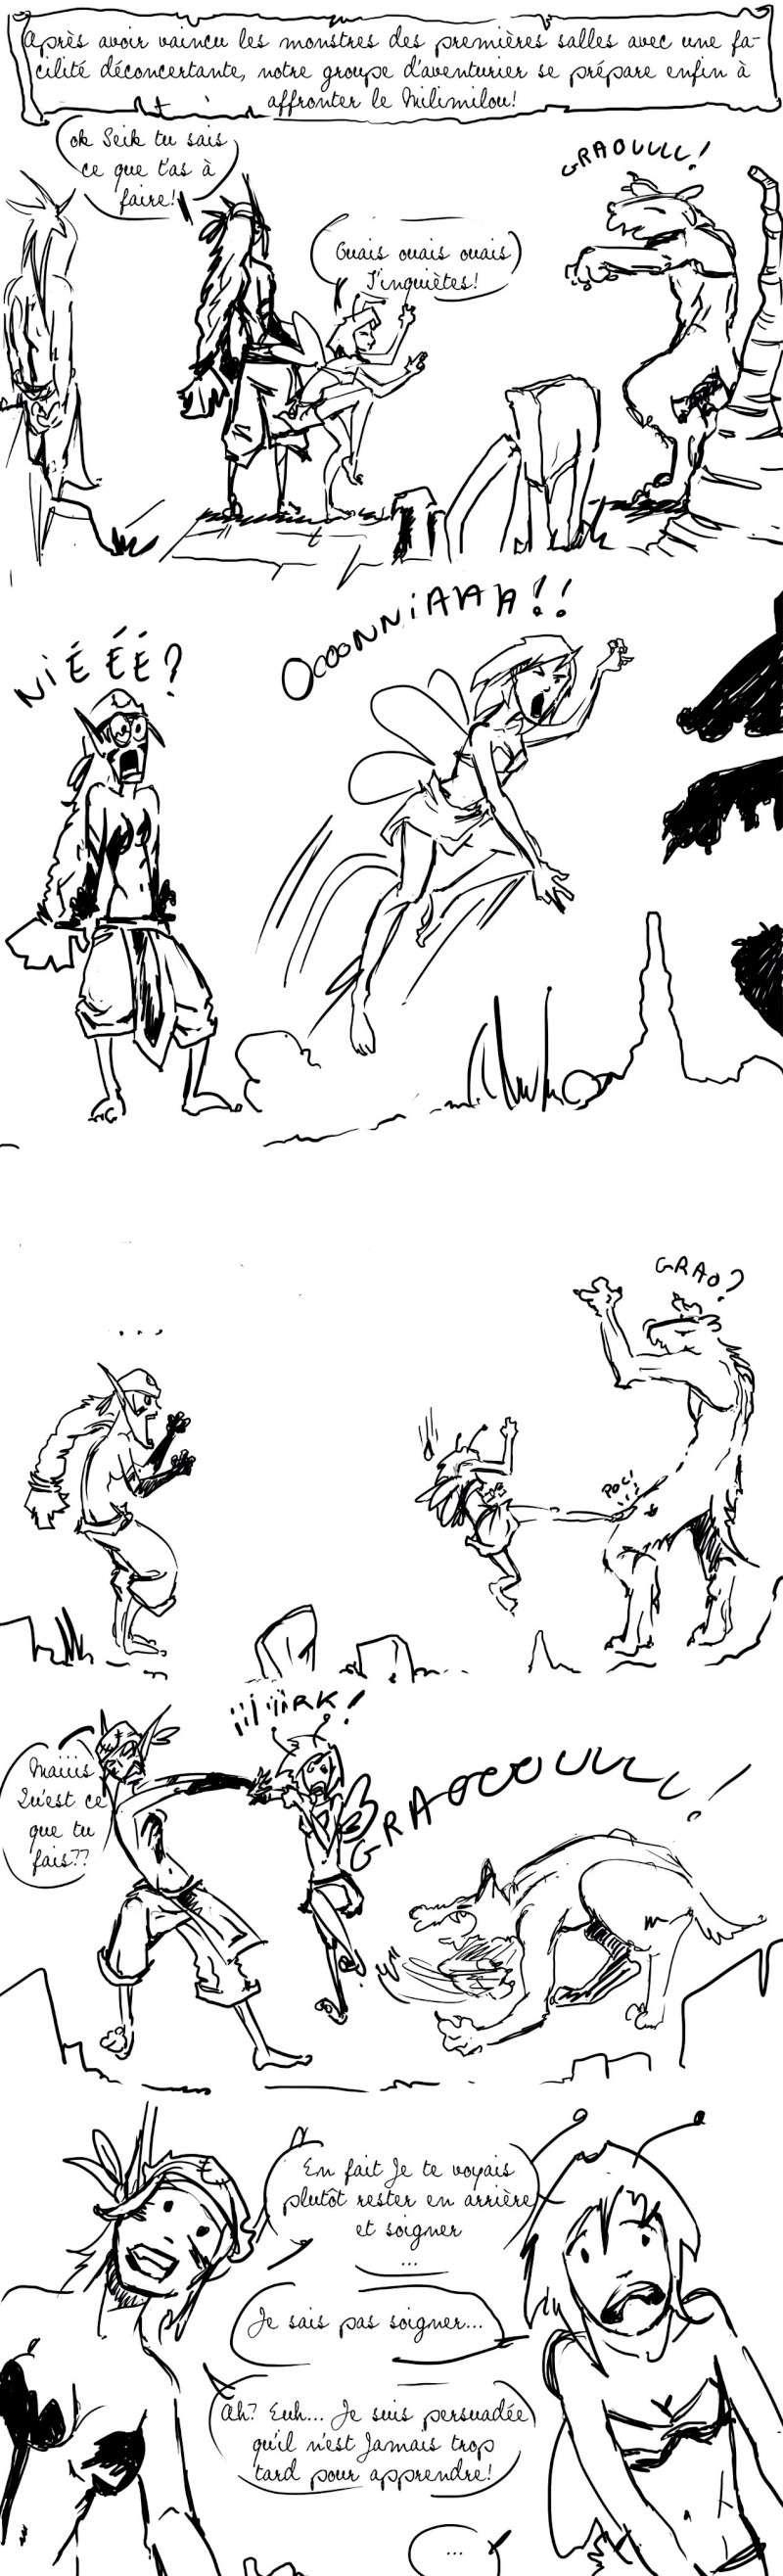 seik et ekis, les aventures ILLUSTREES - Page 4 Strip911